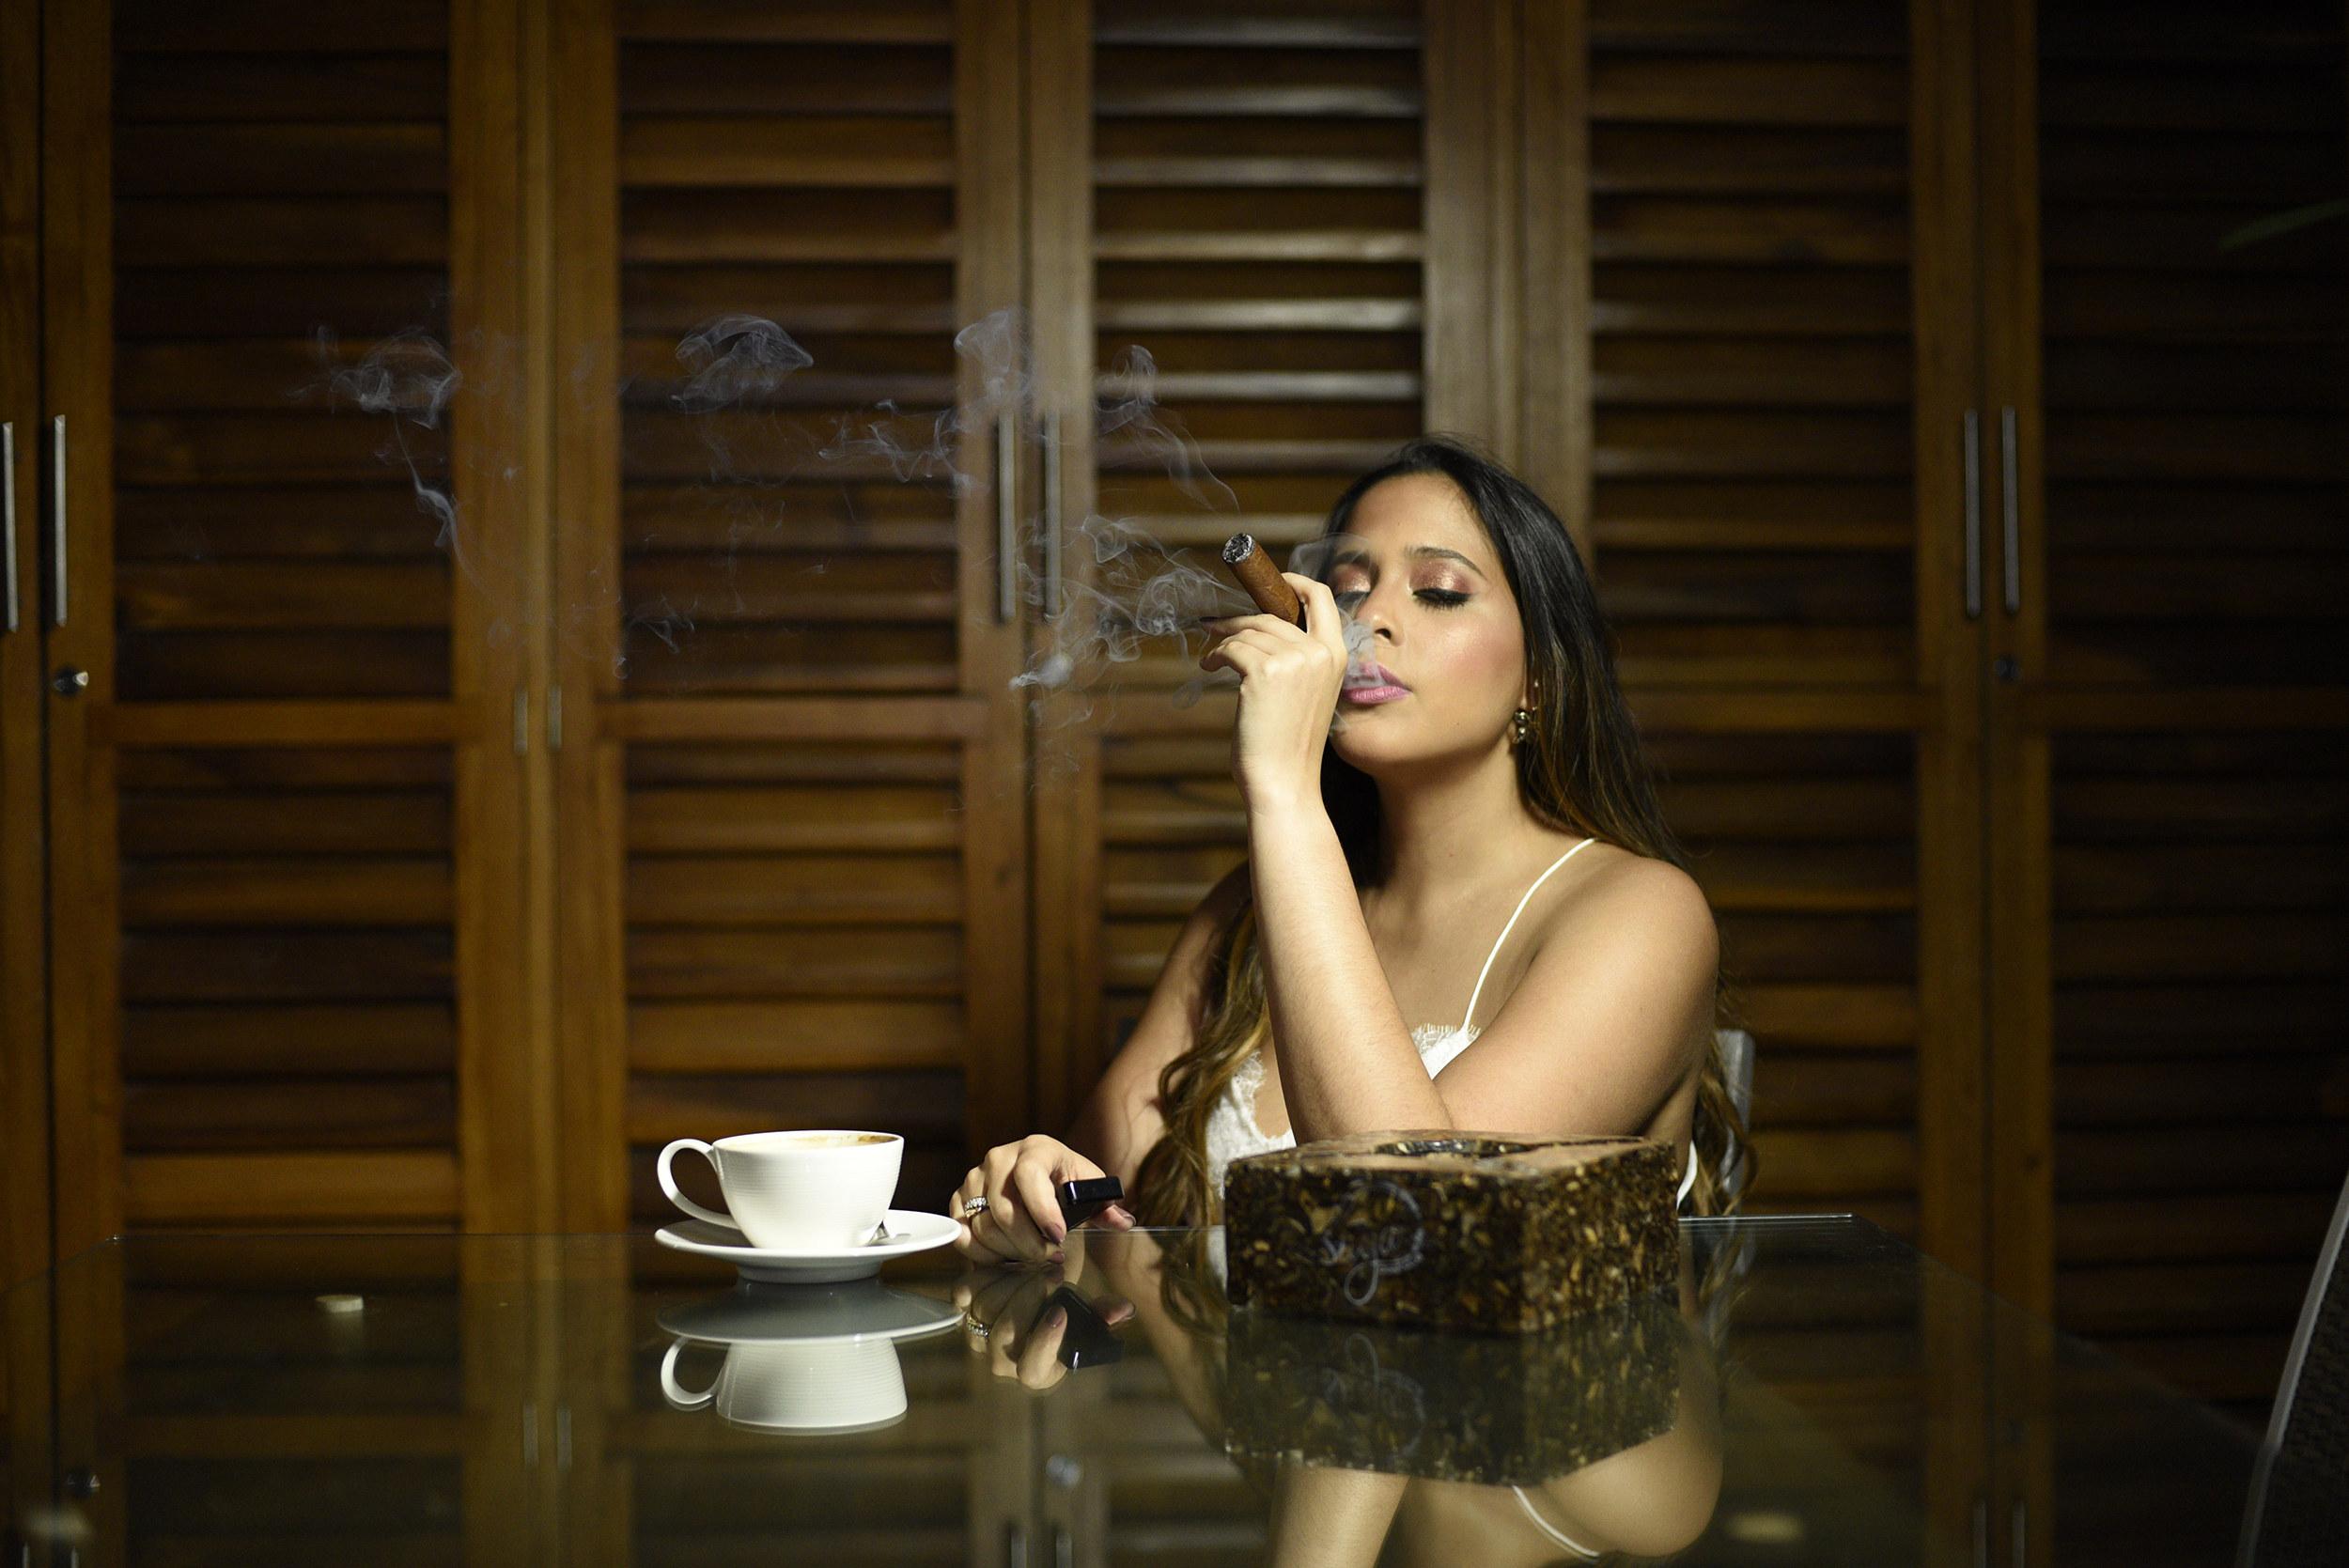 Nirka reyes interview de los reyes cigars